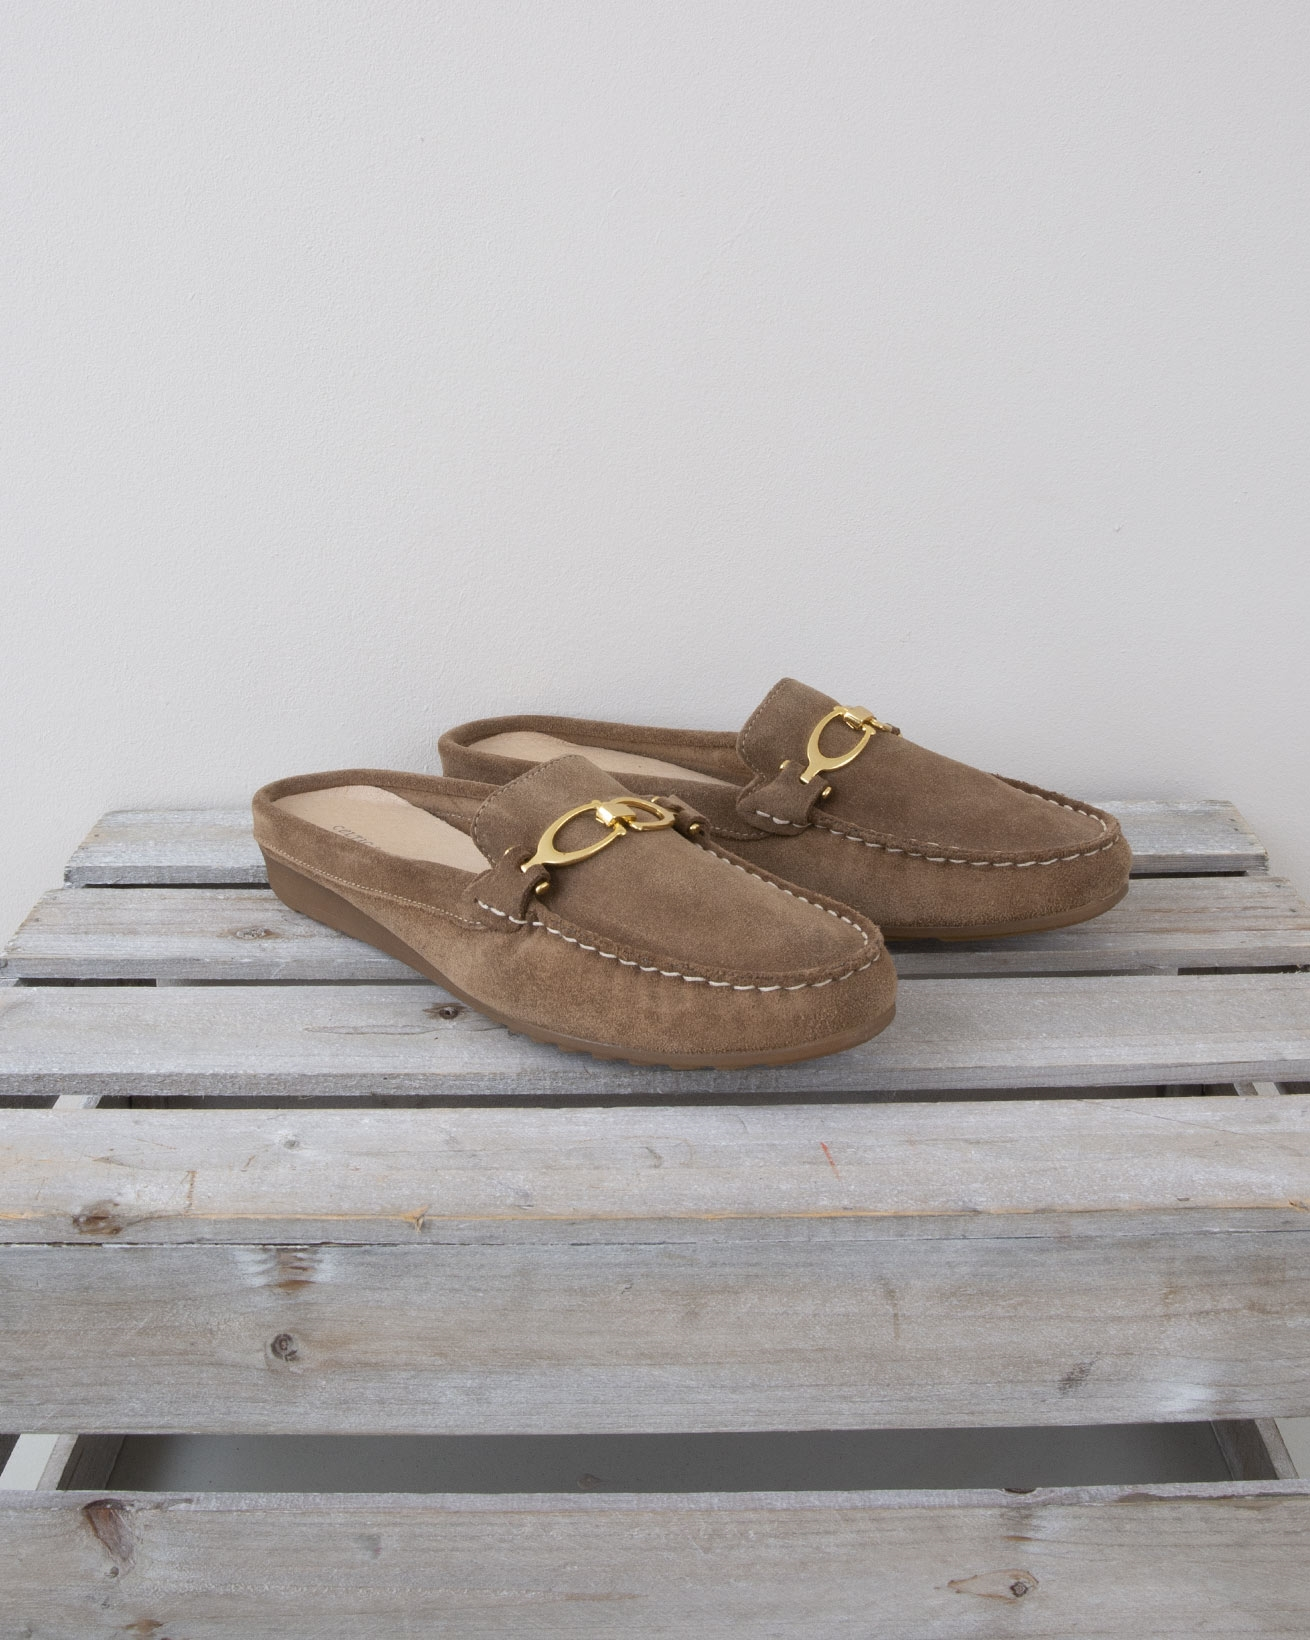 Slip on Loafer Mule - Size 40 - Tan - 1333